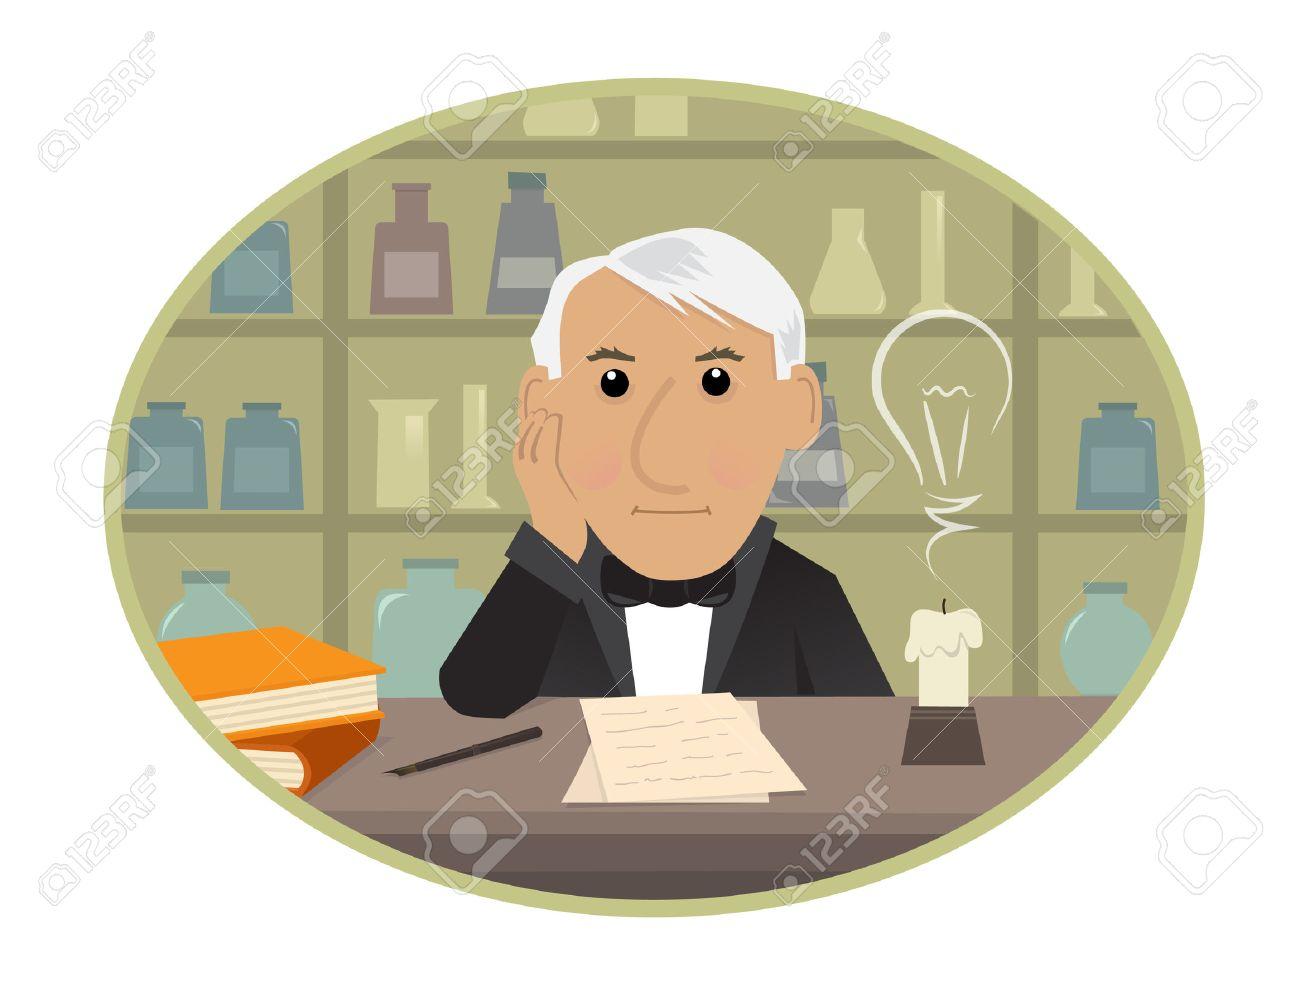 edison cartoon thomas edison is sitting behind his desk and rh 123rf com thomas alva edison clipart Thomas Edison Poster